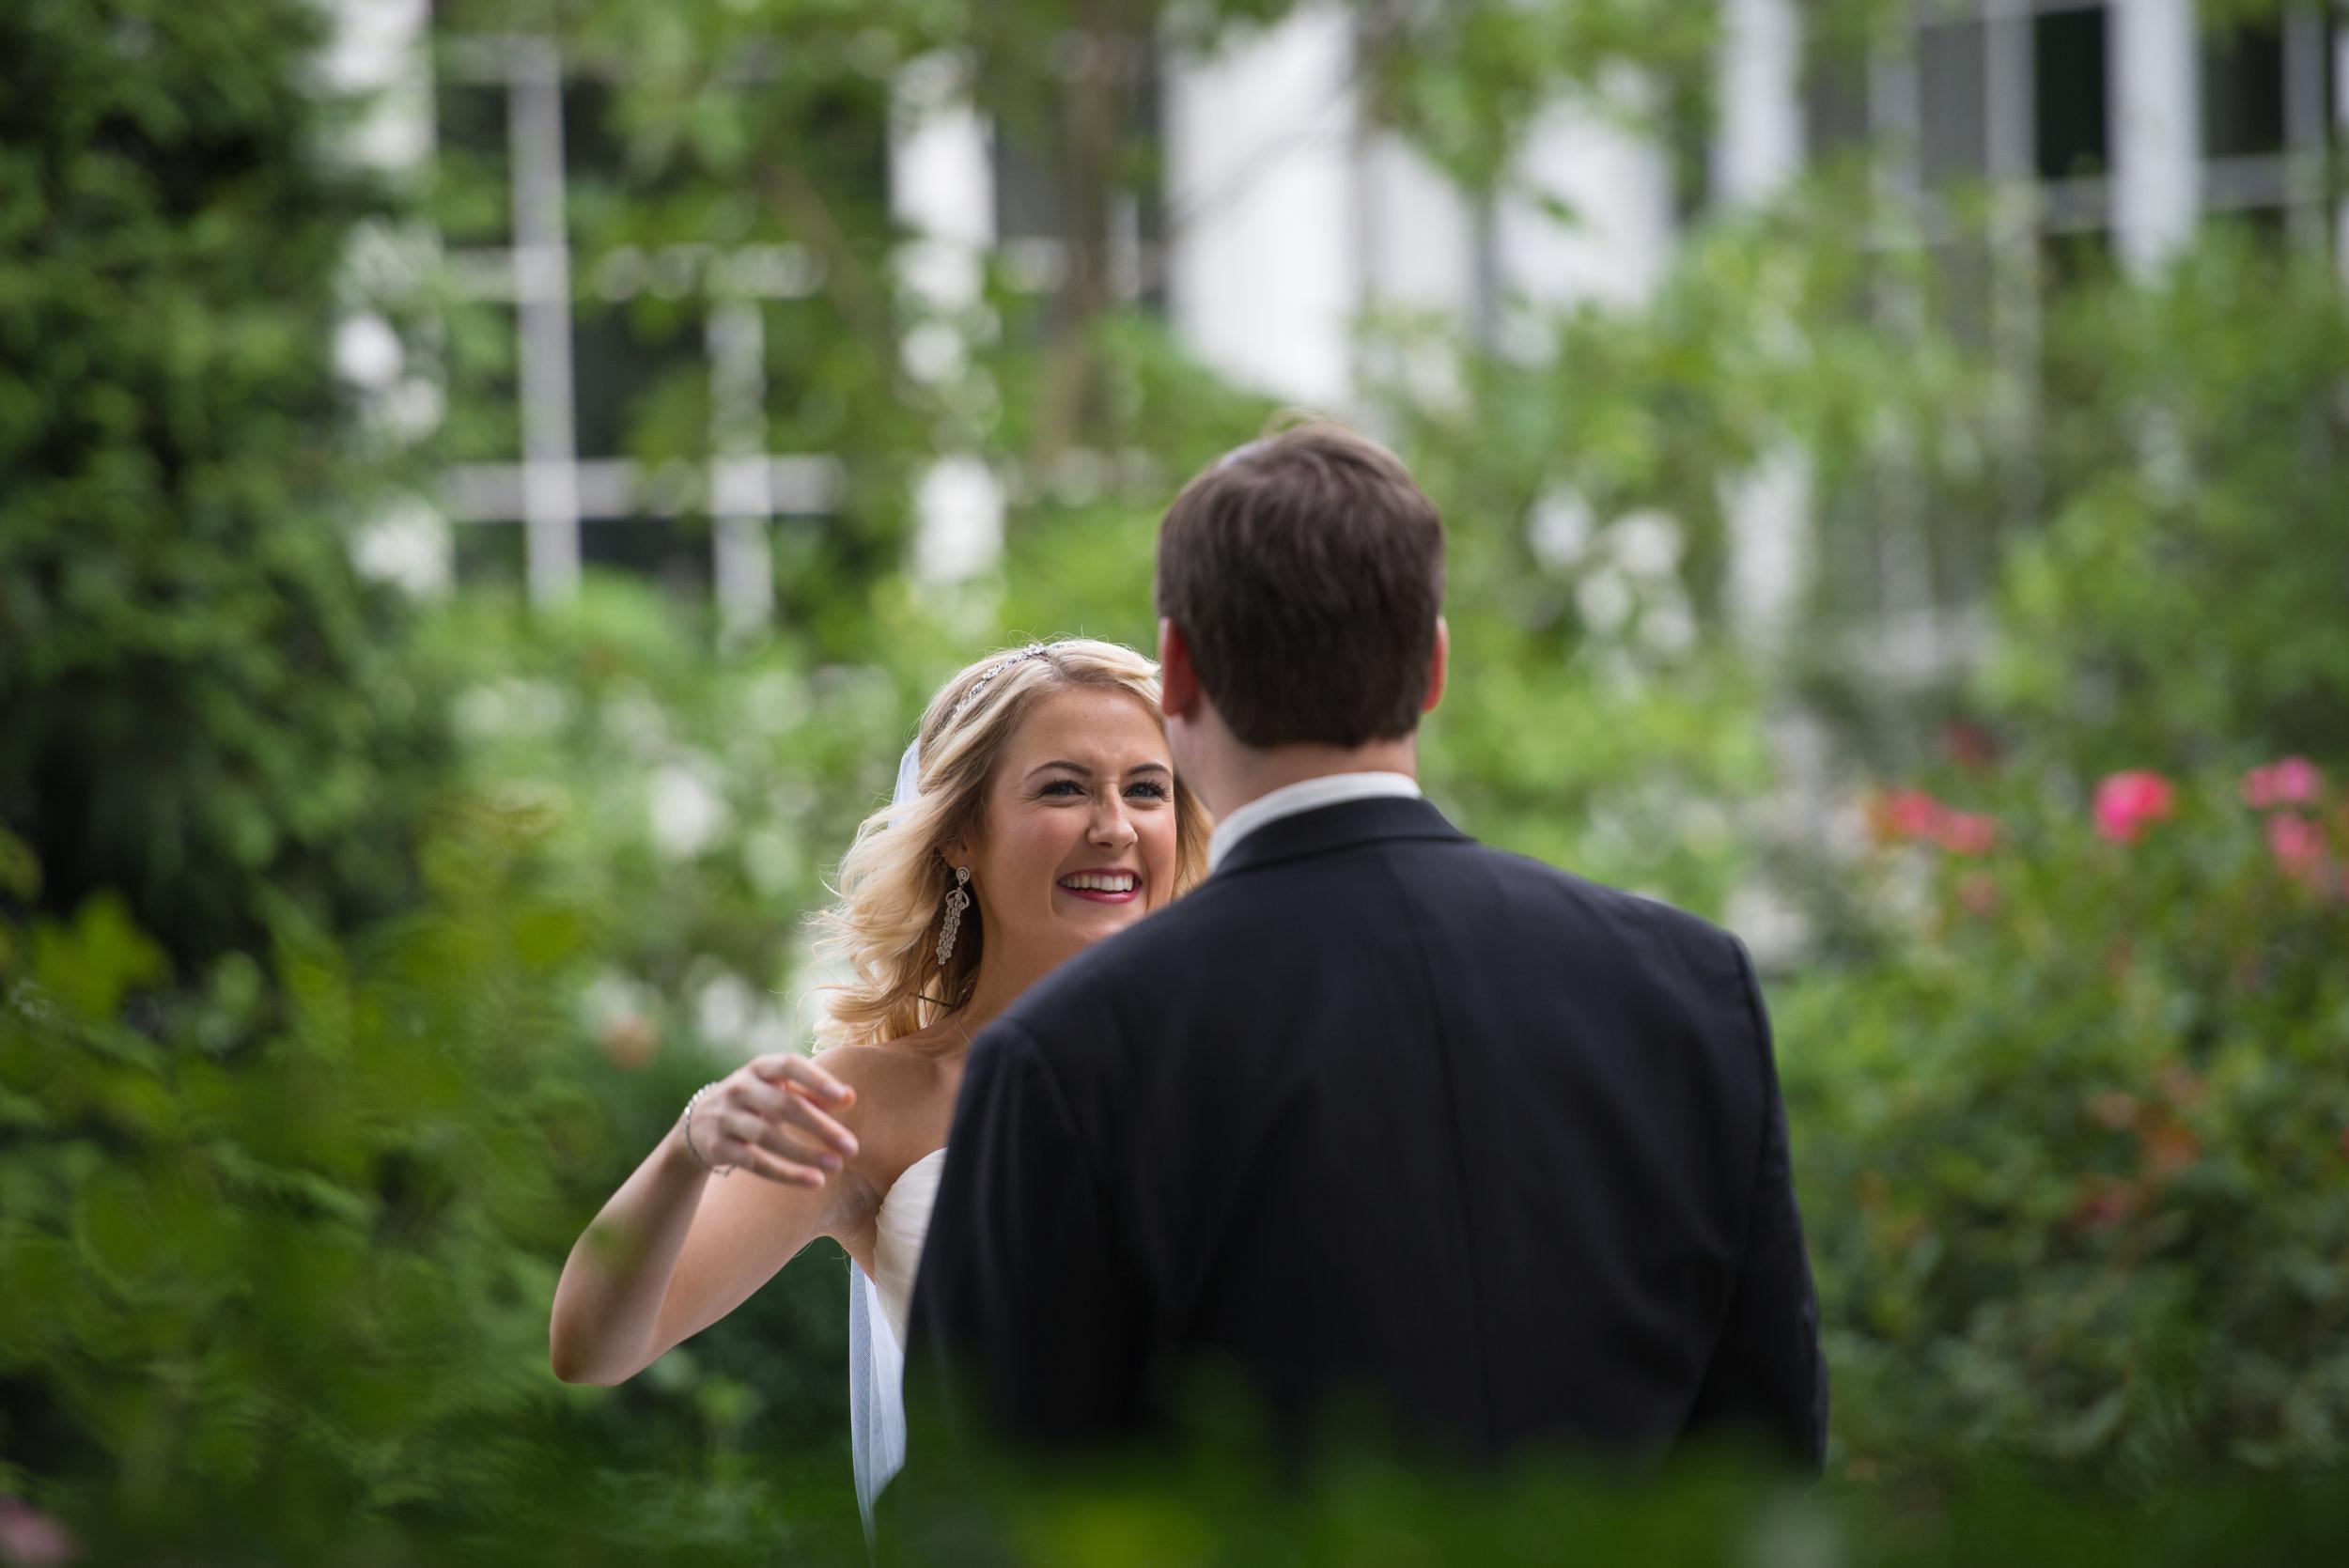 Wedding First Look Photos00925.jpg